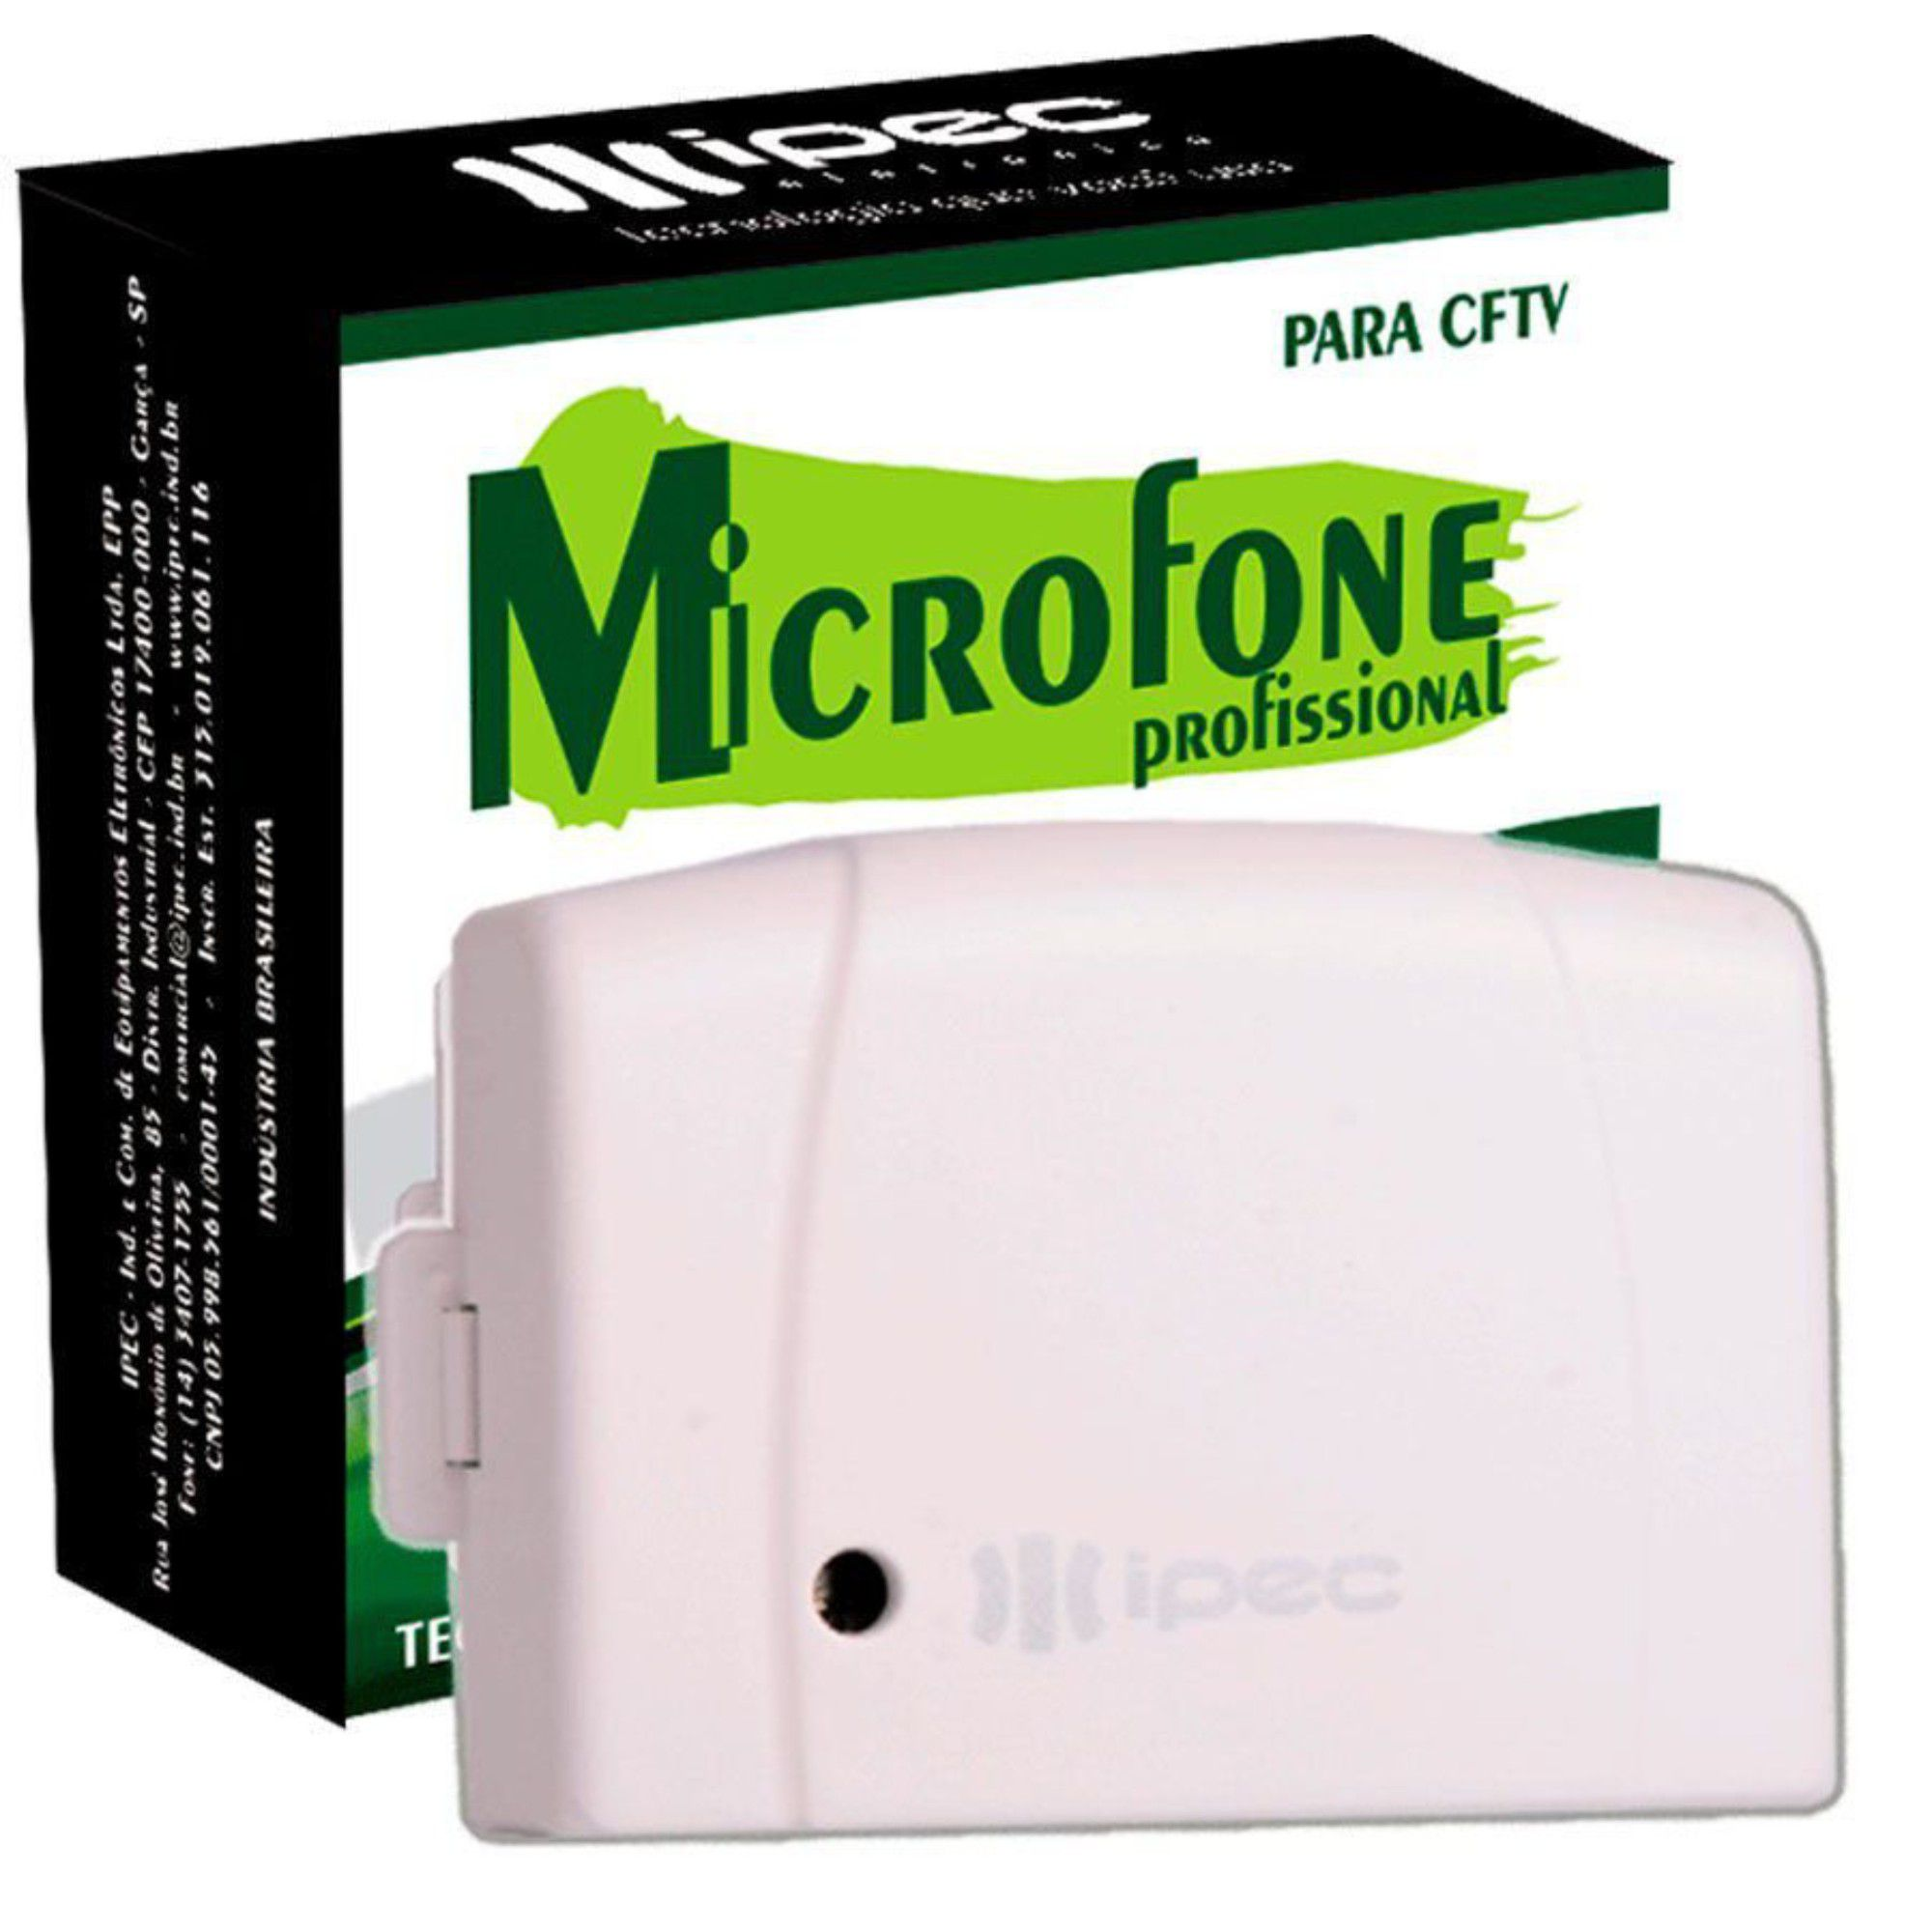 Microfone Amplicado Profissional P/ CFTV Ipec